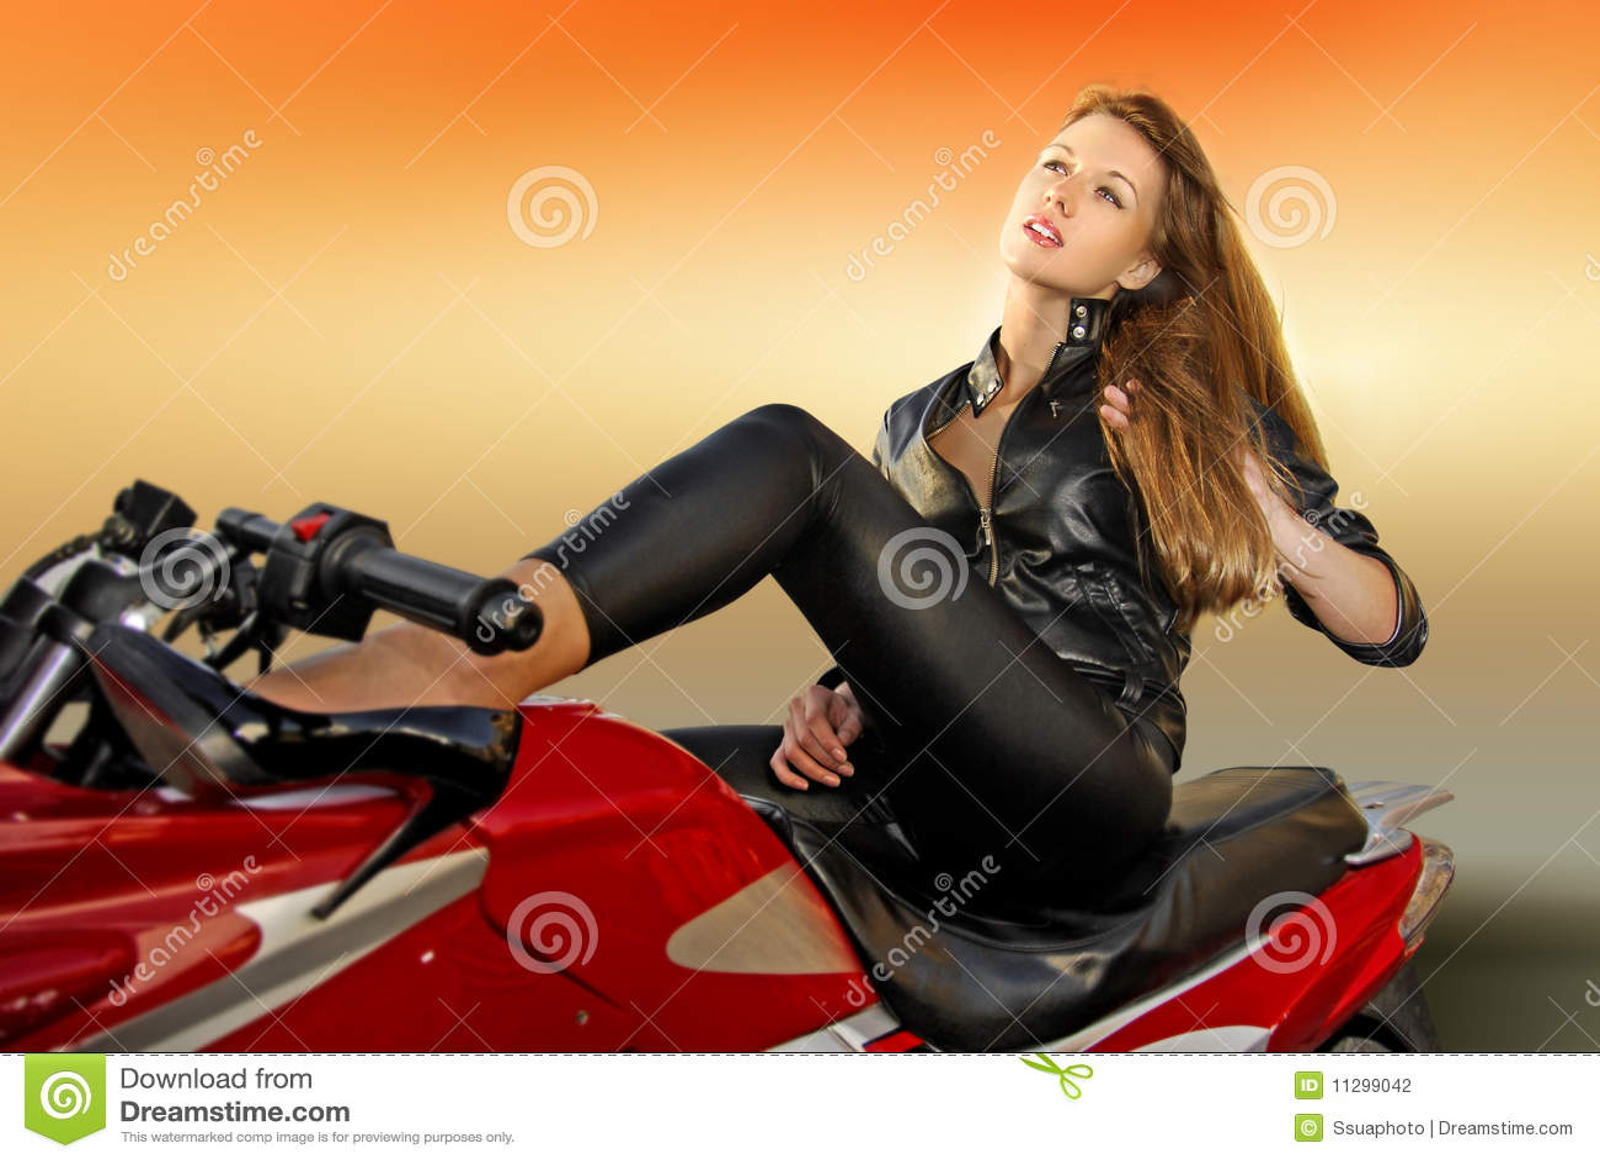 Muchacha rubia en una motocicleta